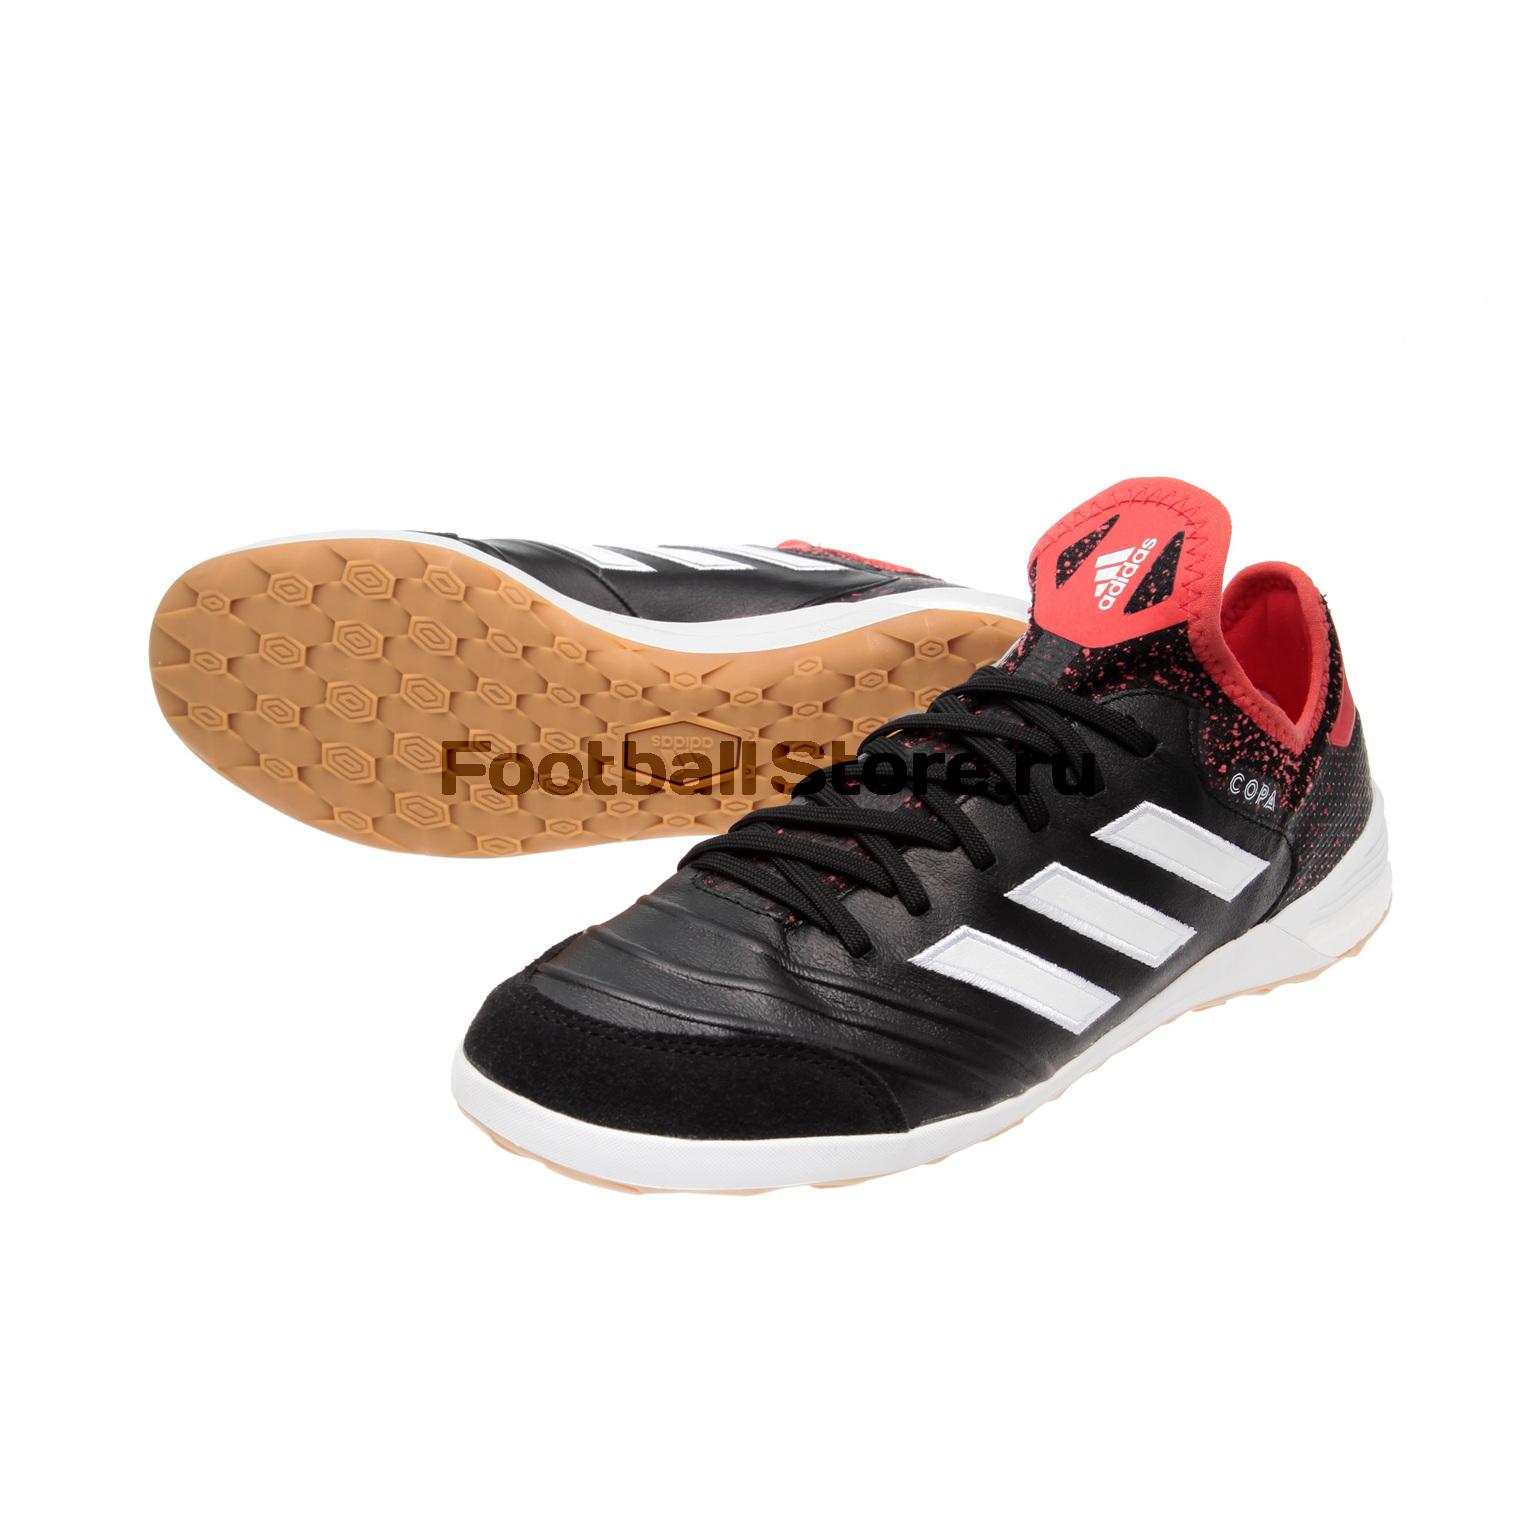 Обувь для зала Adidas Copa Tango 18.1 IN CP8981 обувь для зала adidas ace tango 18 3 in jr cp9075